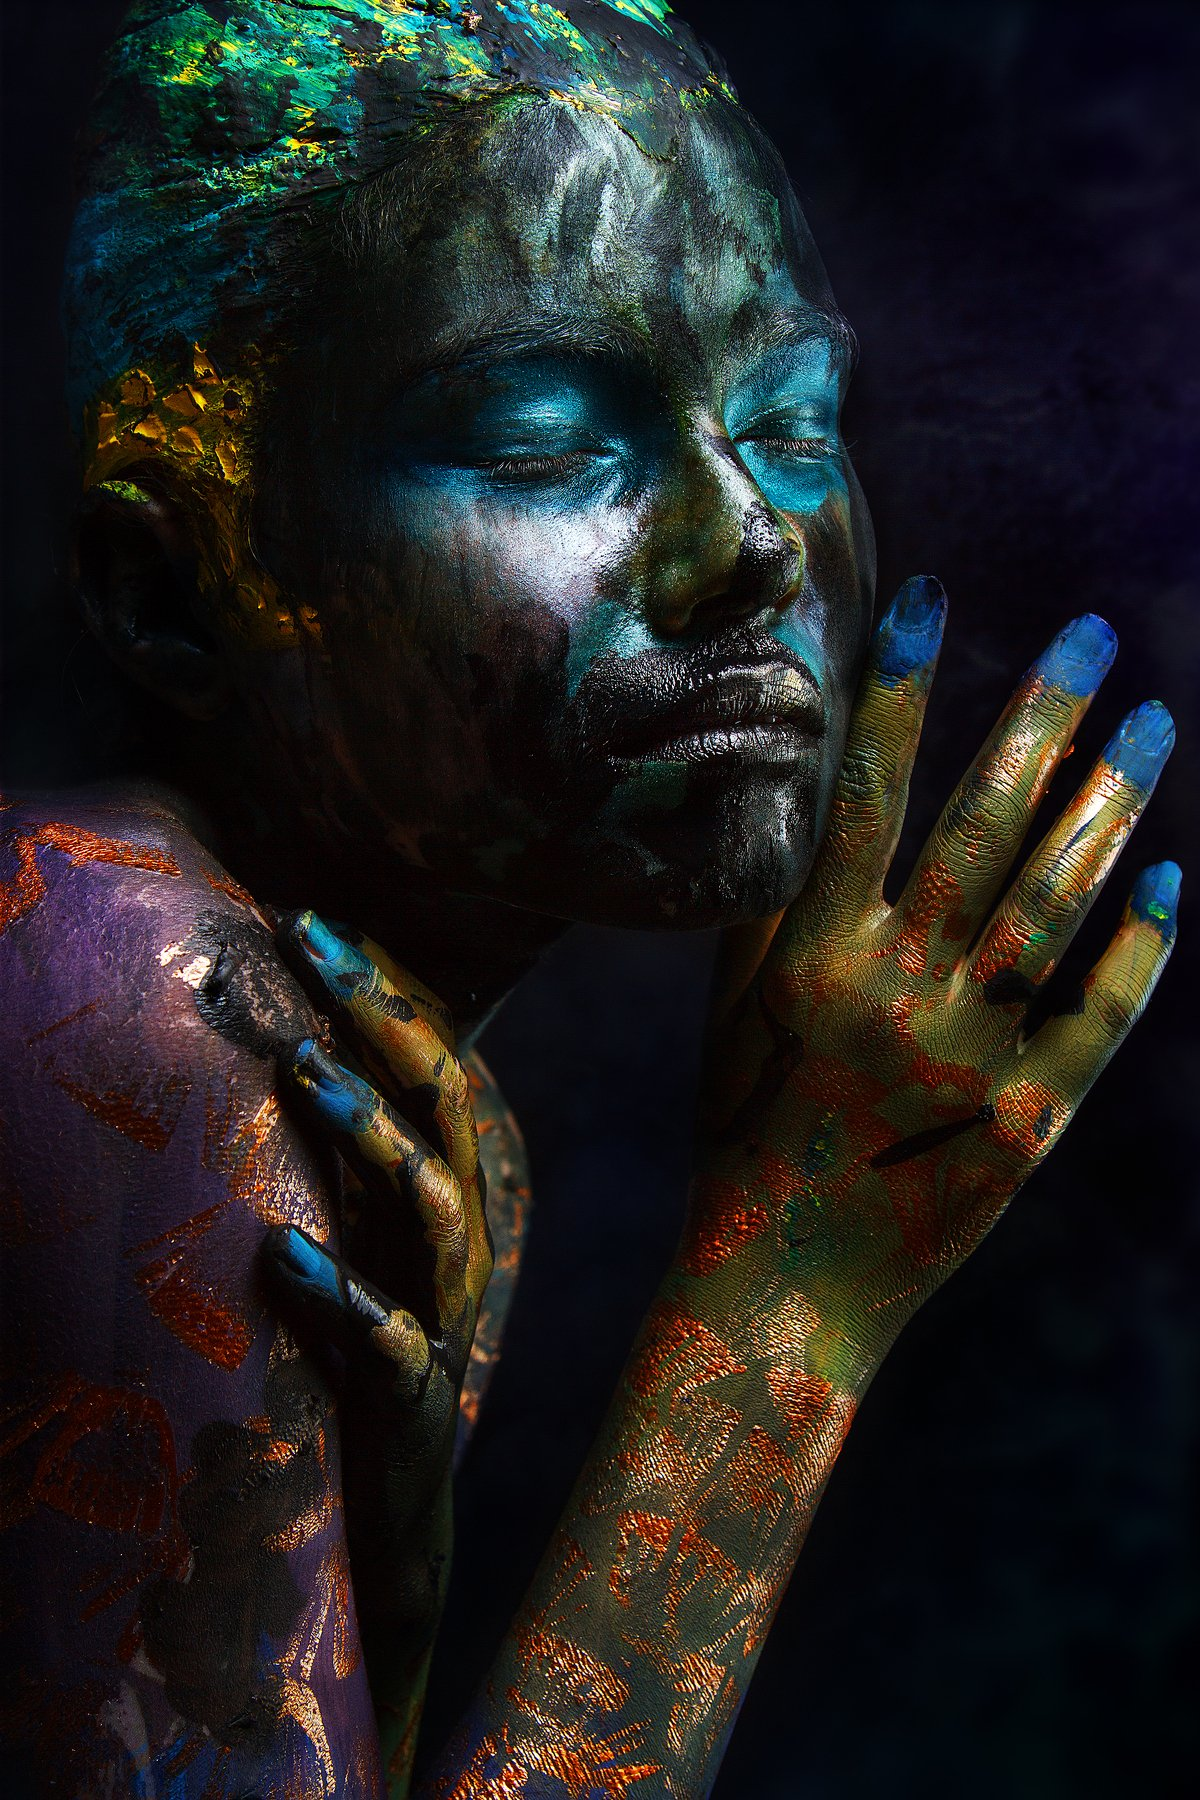 people, girl, portrait, art, body, oil, fish, texture, relief, eye, neck, paint, makeup, body art, forever, opinion, creative, Ковалёв Иван